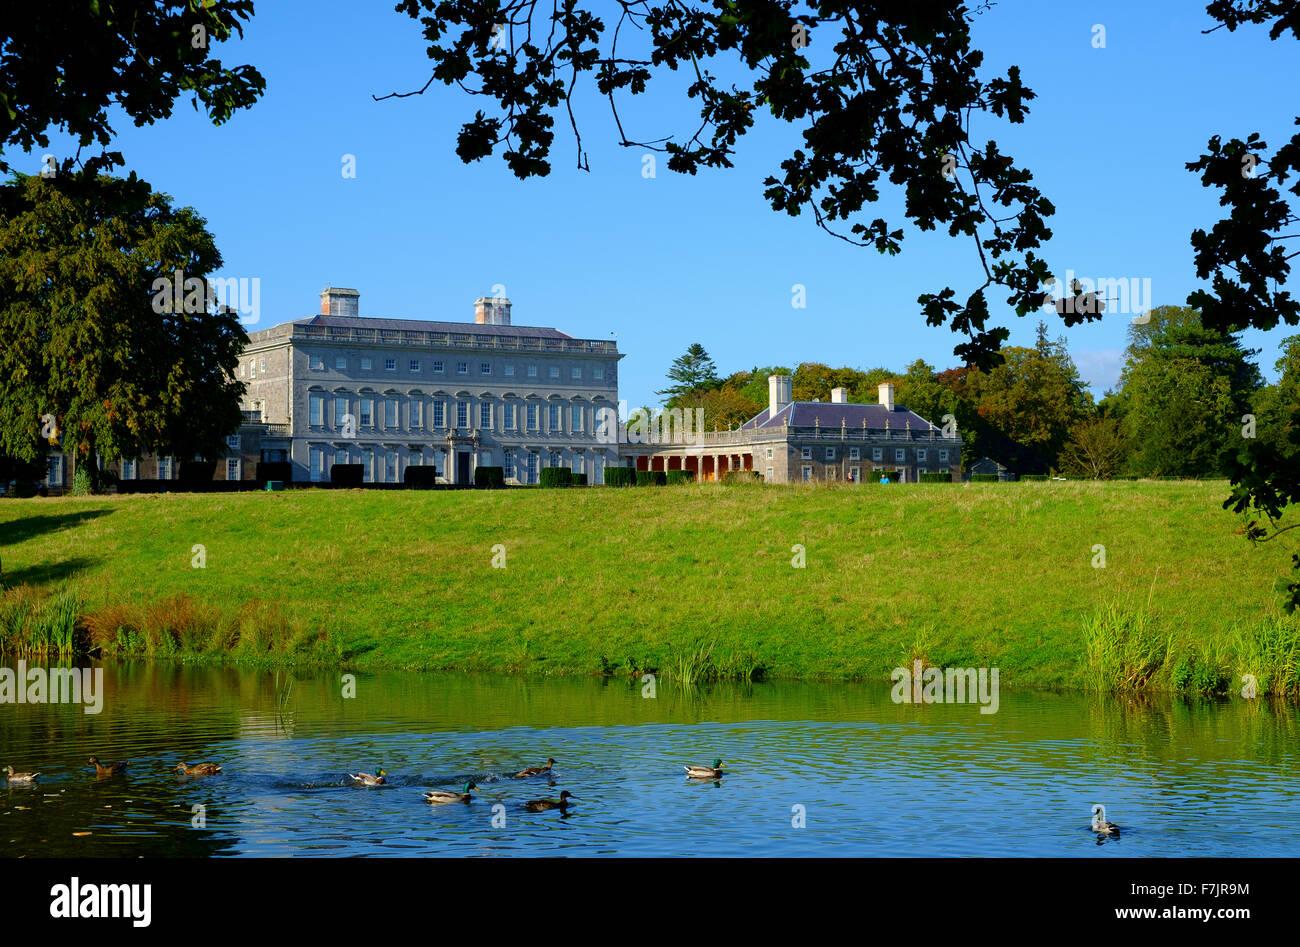 castletown house kildare ireland - Stock Image